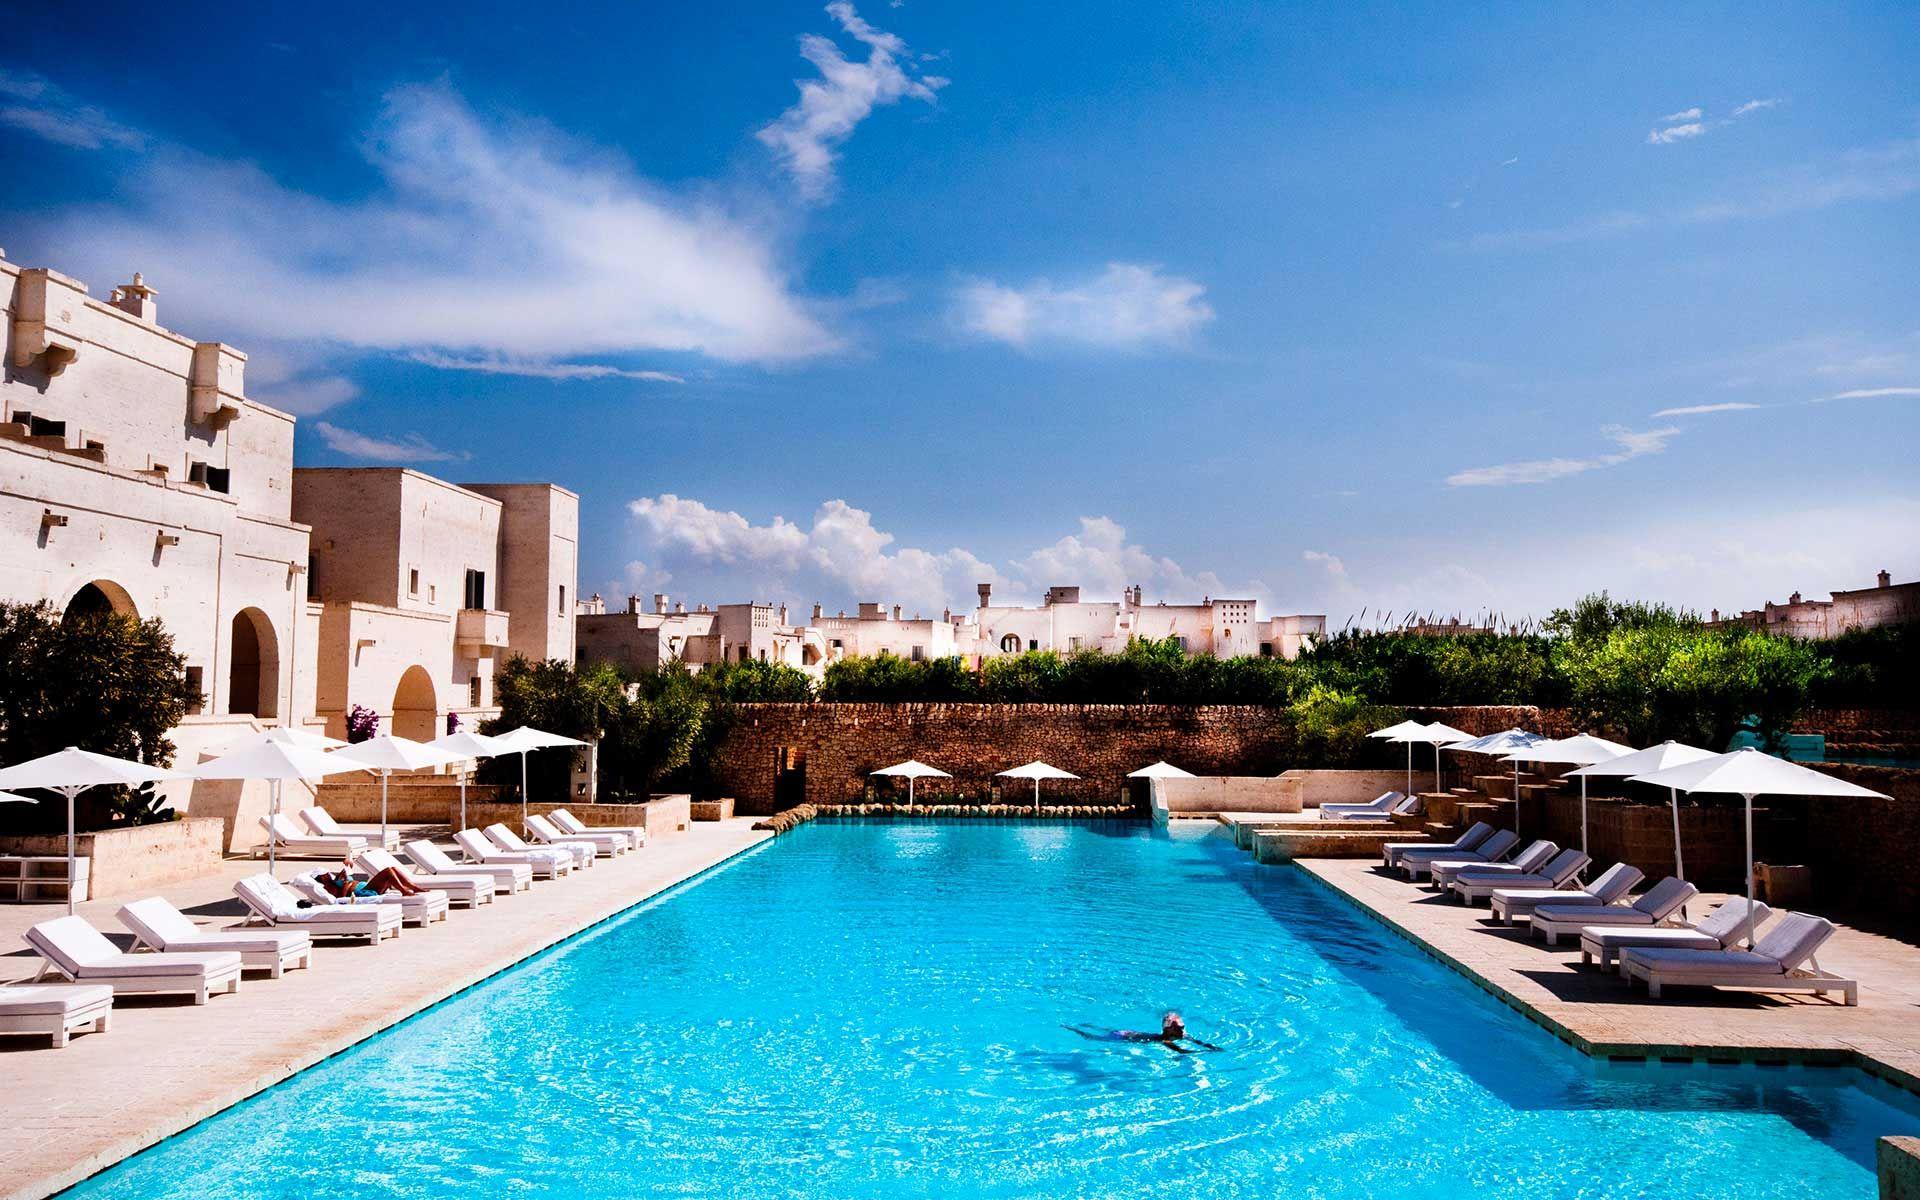 Borgo Egnazia 5 Star Hotel In Puglia Official Website Italy Hotels Puglia Italy Luxury Travel Destinations